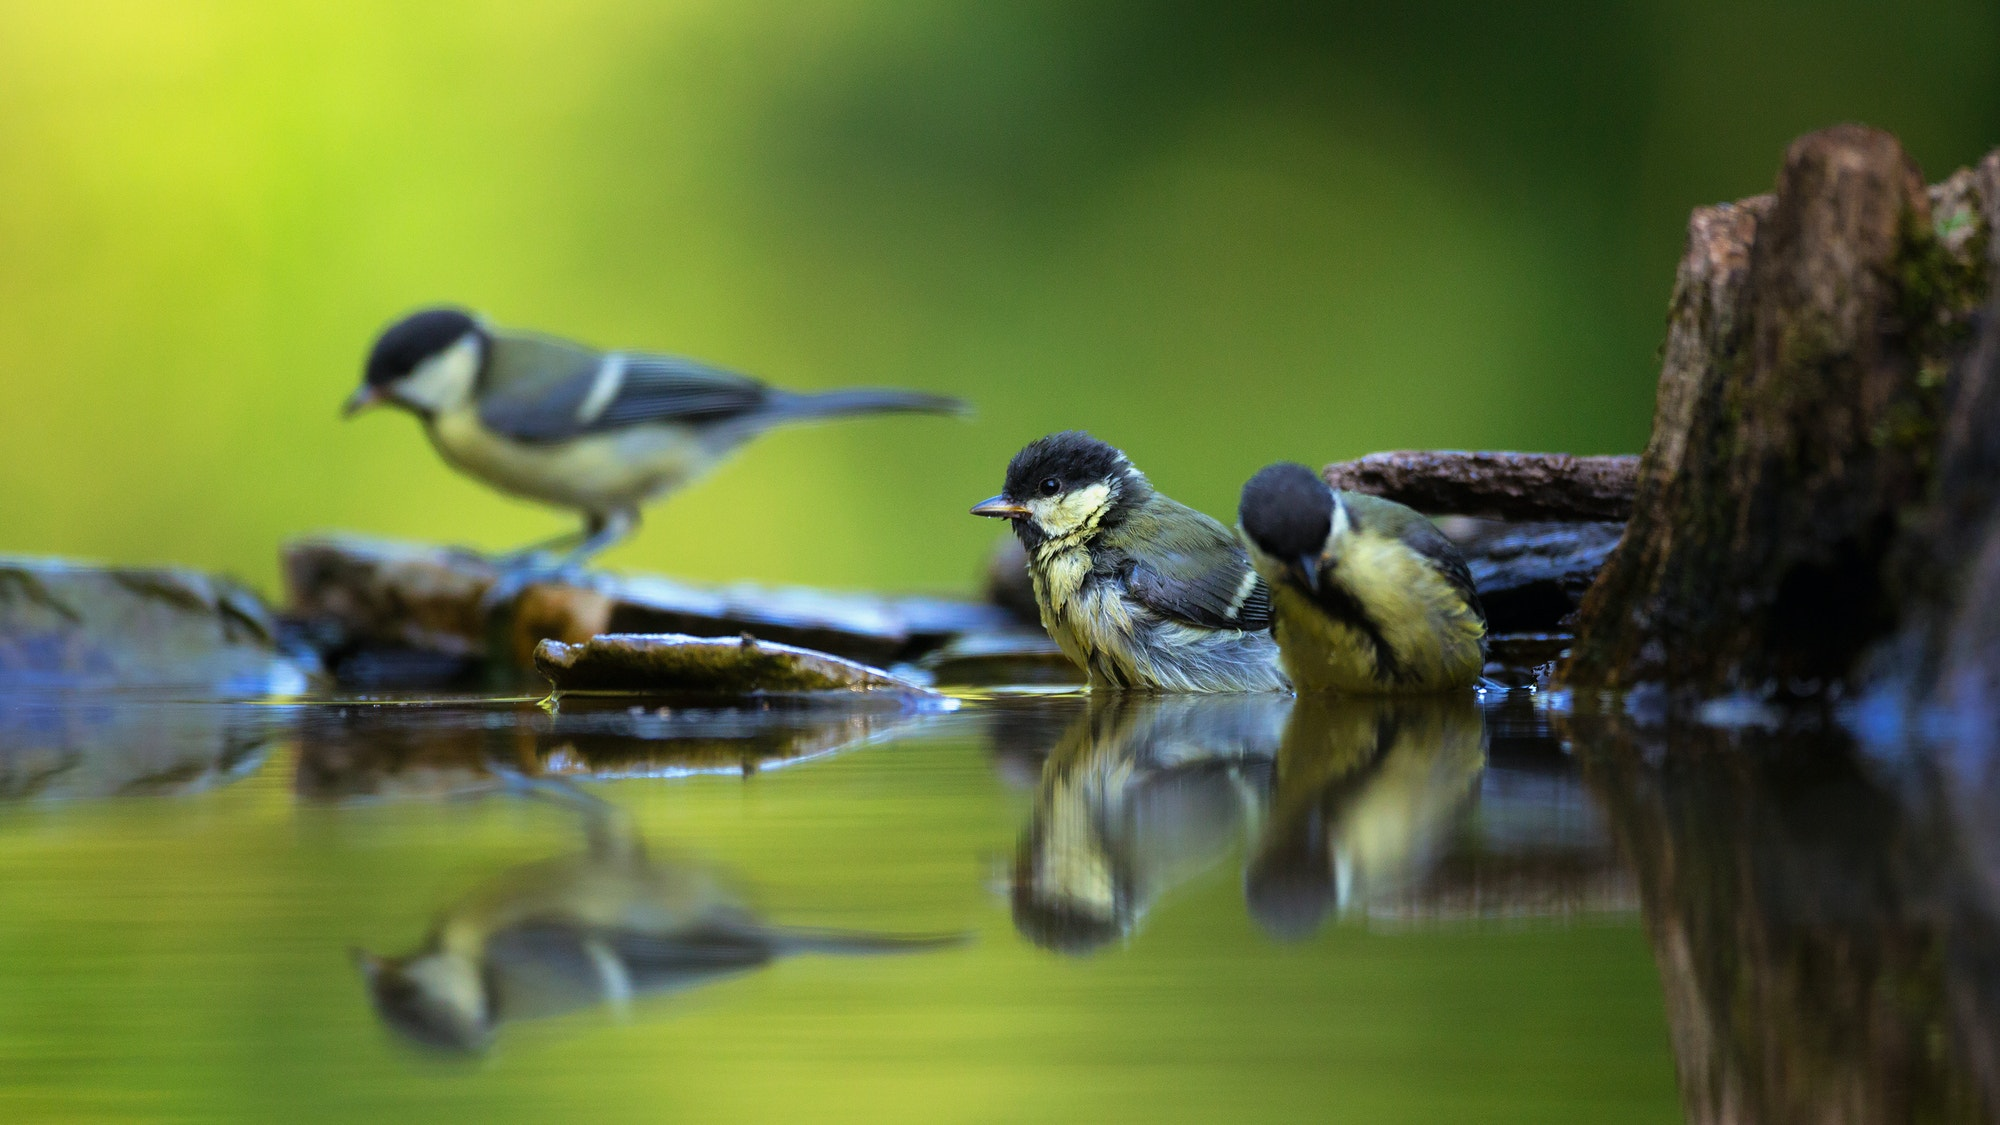 Rewilding smaller scale